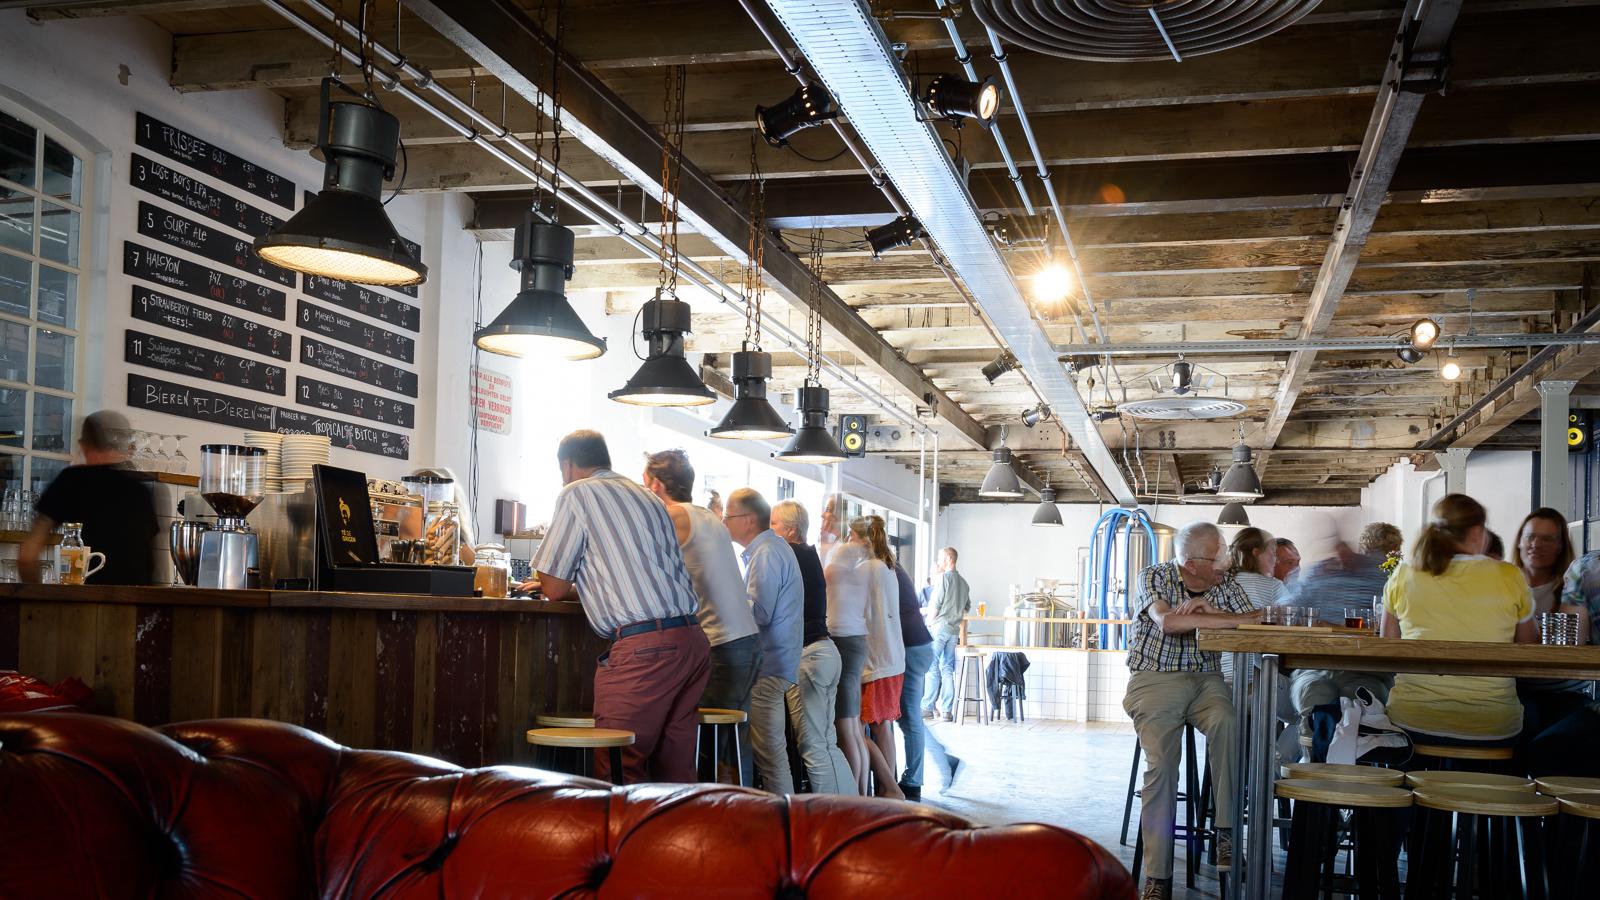 architectuurfotografie, architectuur, fotografie, interieur, bierbrouwerij